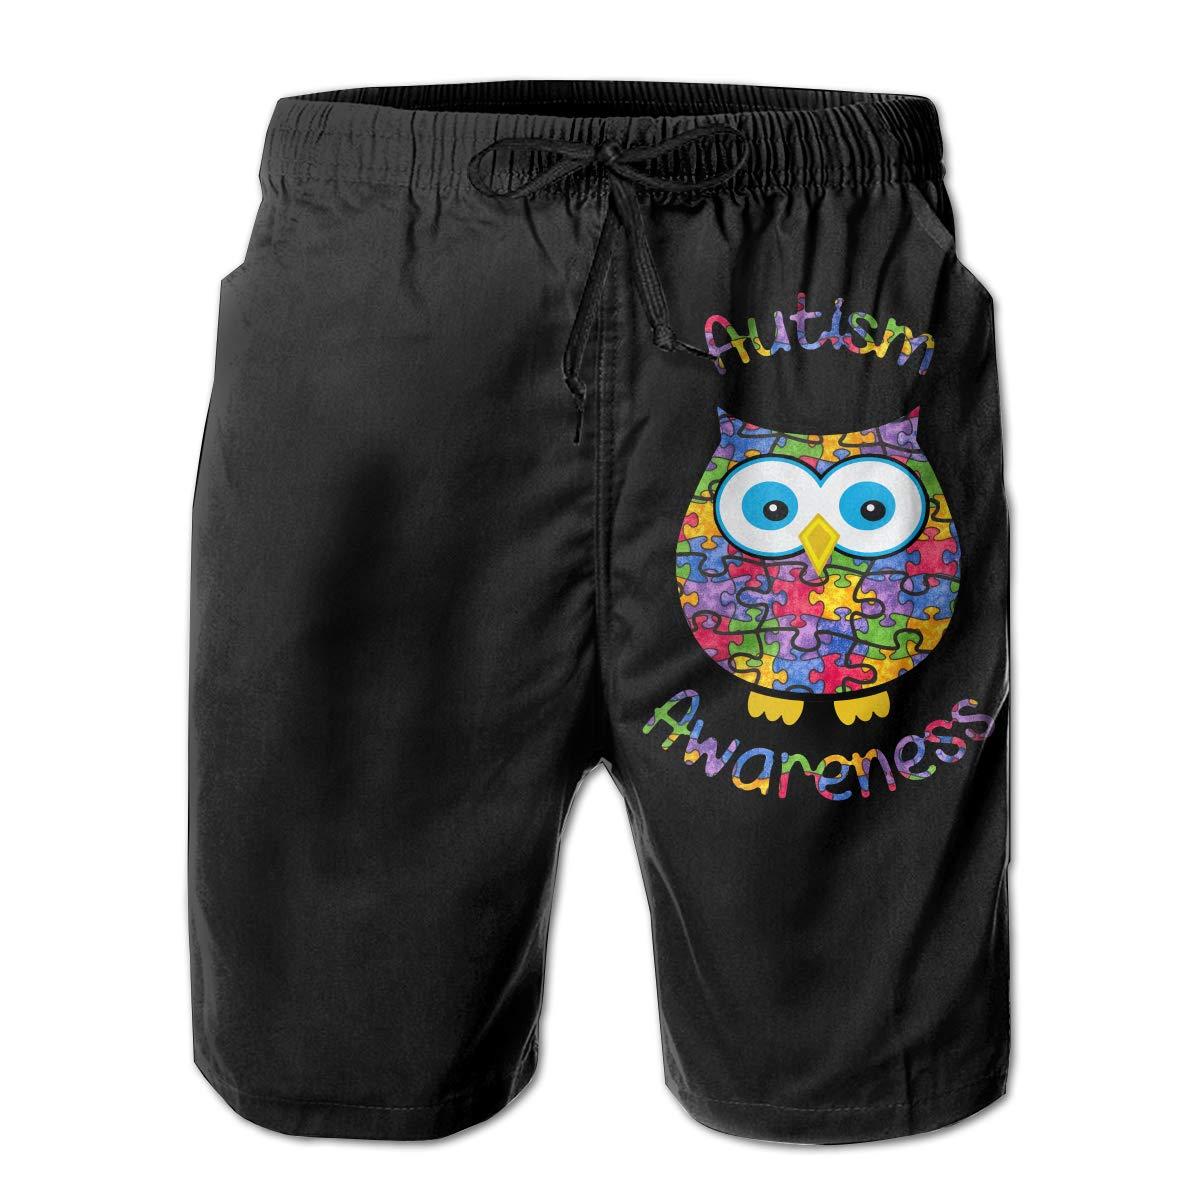 Autism Awareness Owl-1 Mens Beach Board Shorts Drawstring Bathing Suit